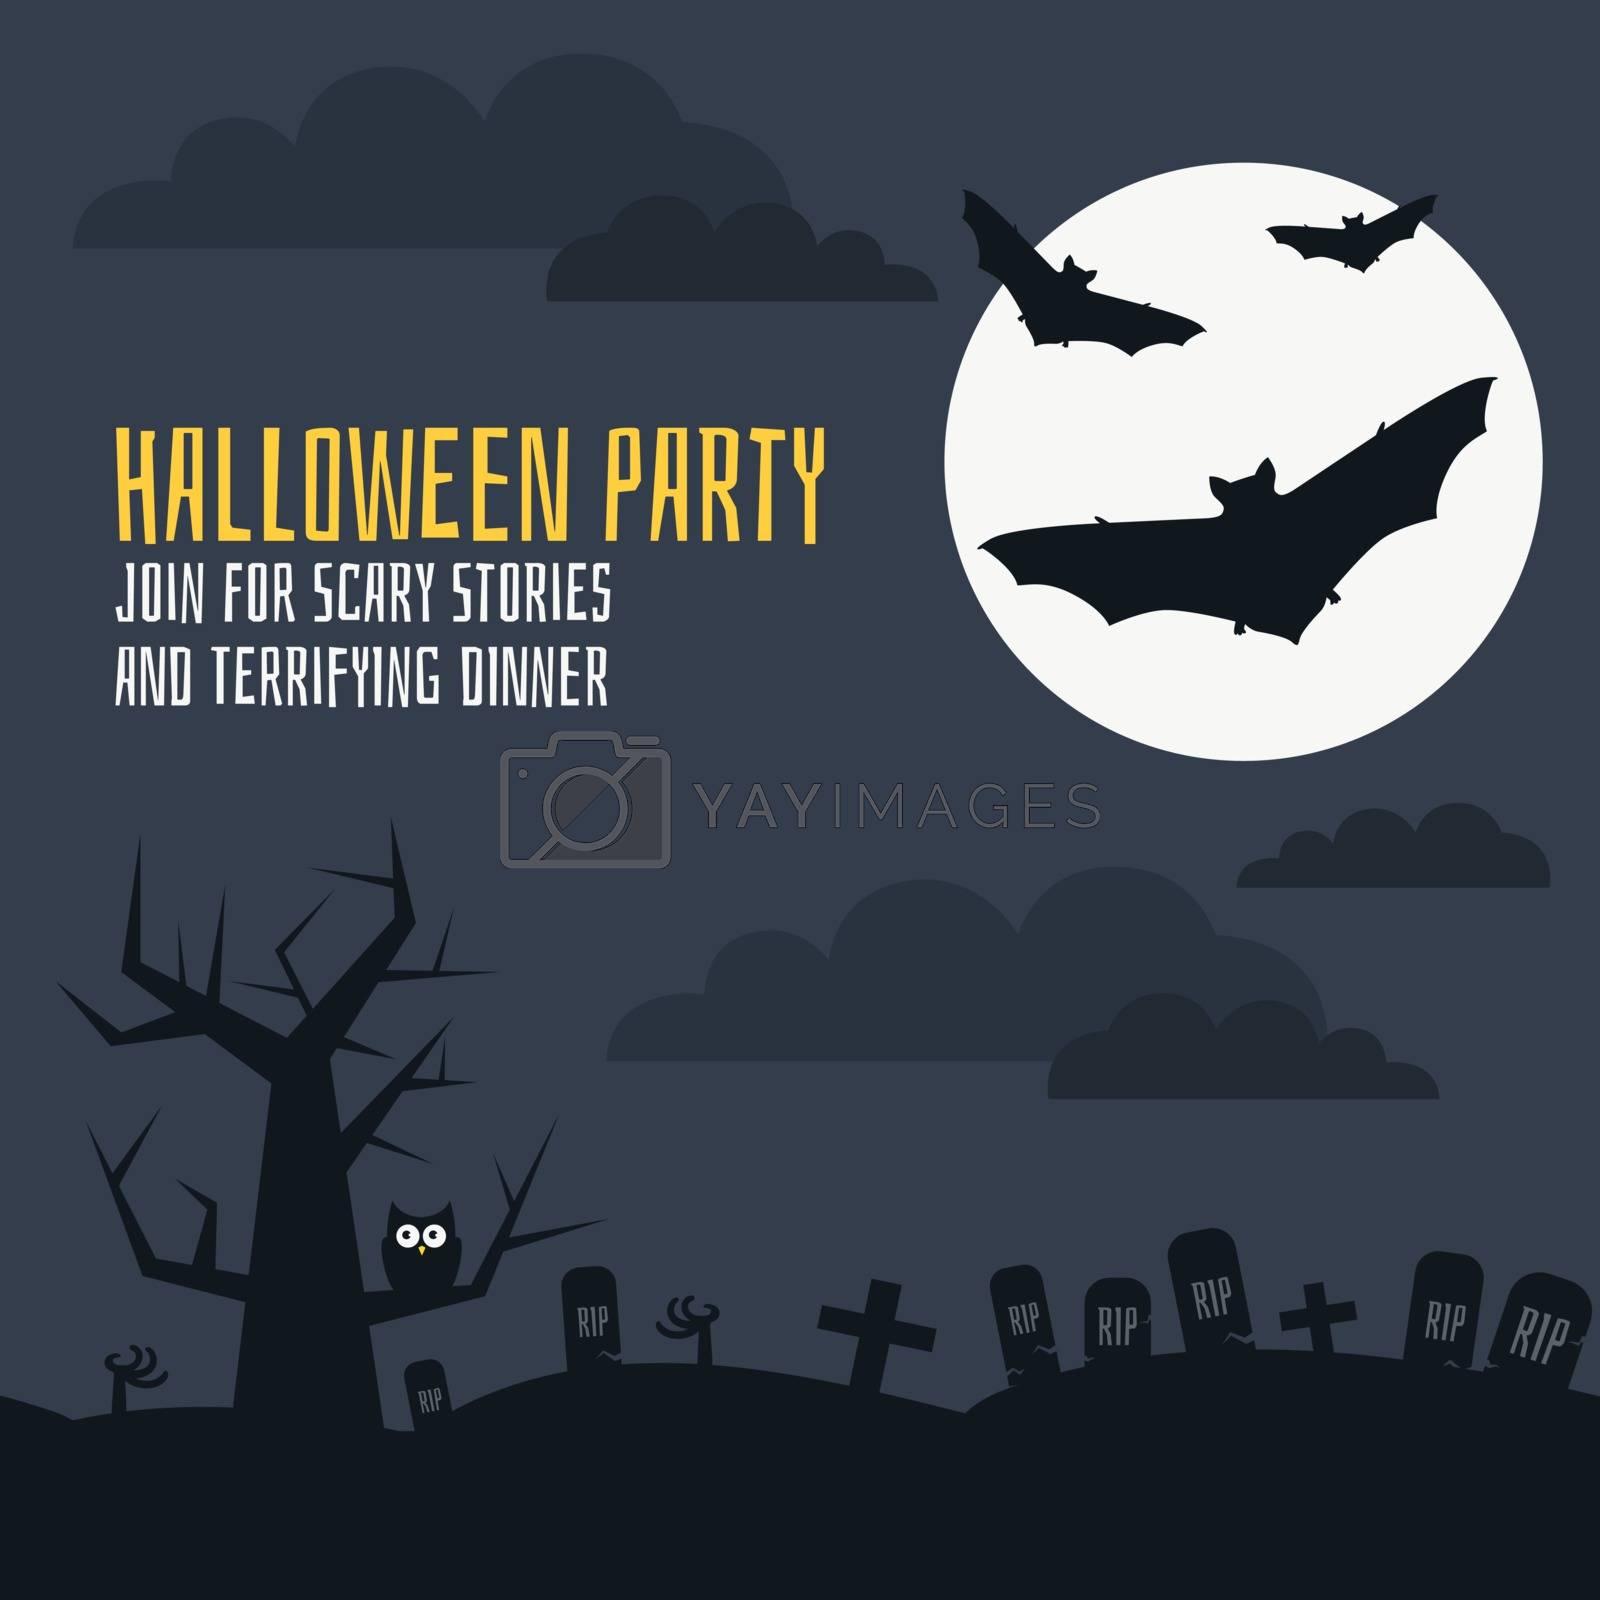 Halloween card template with bats, moon, cementry, owl. Flat vector scary halloween part invitation card.